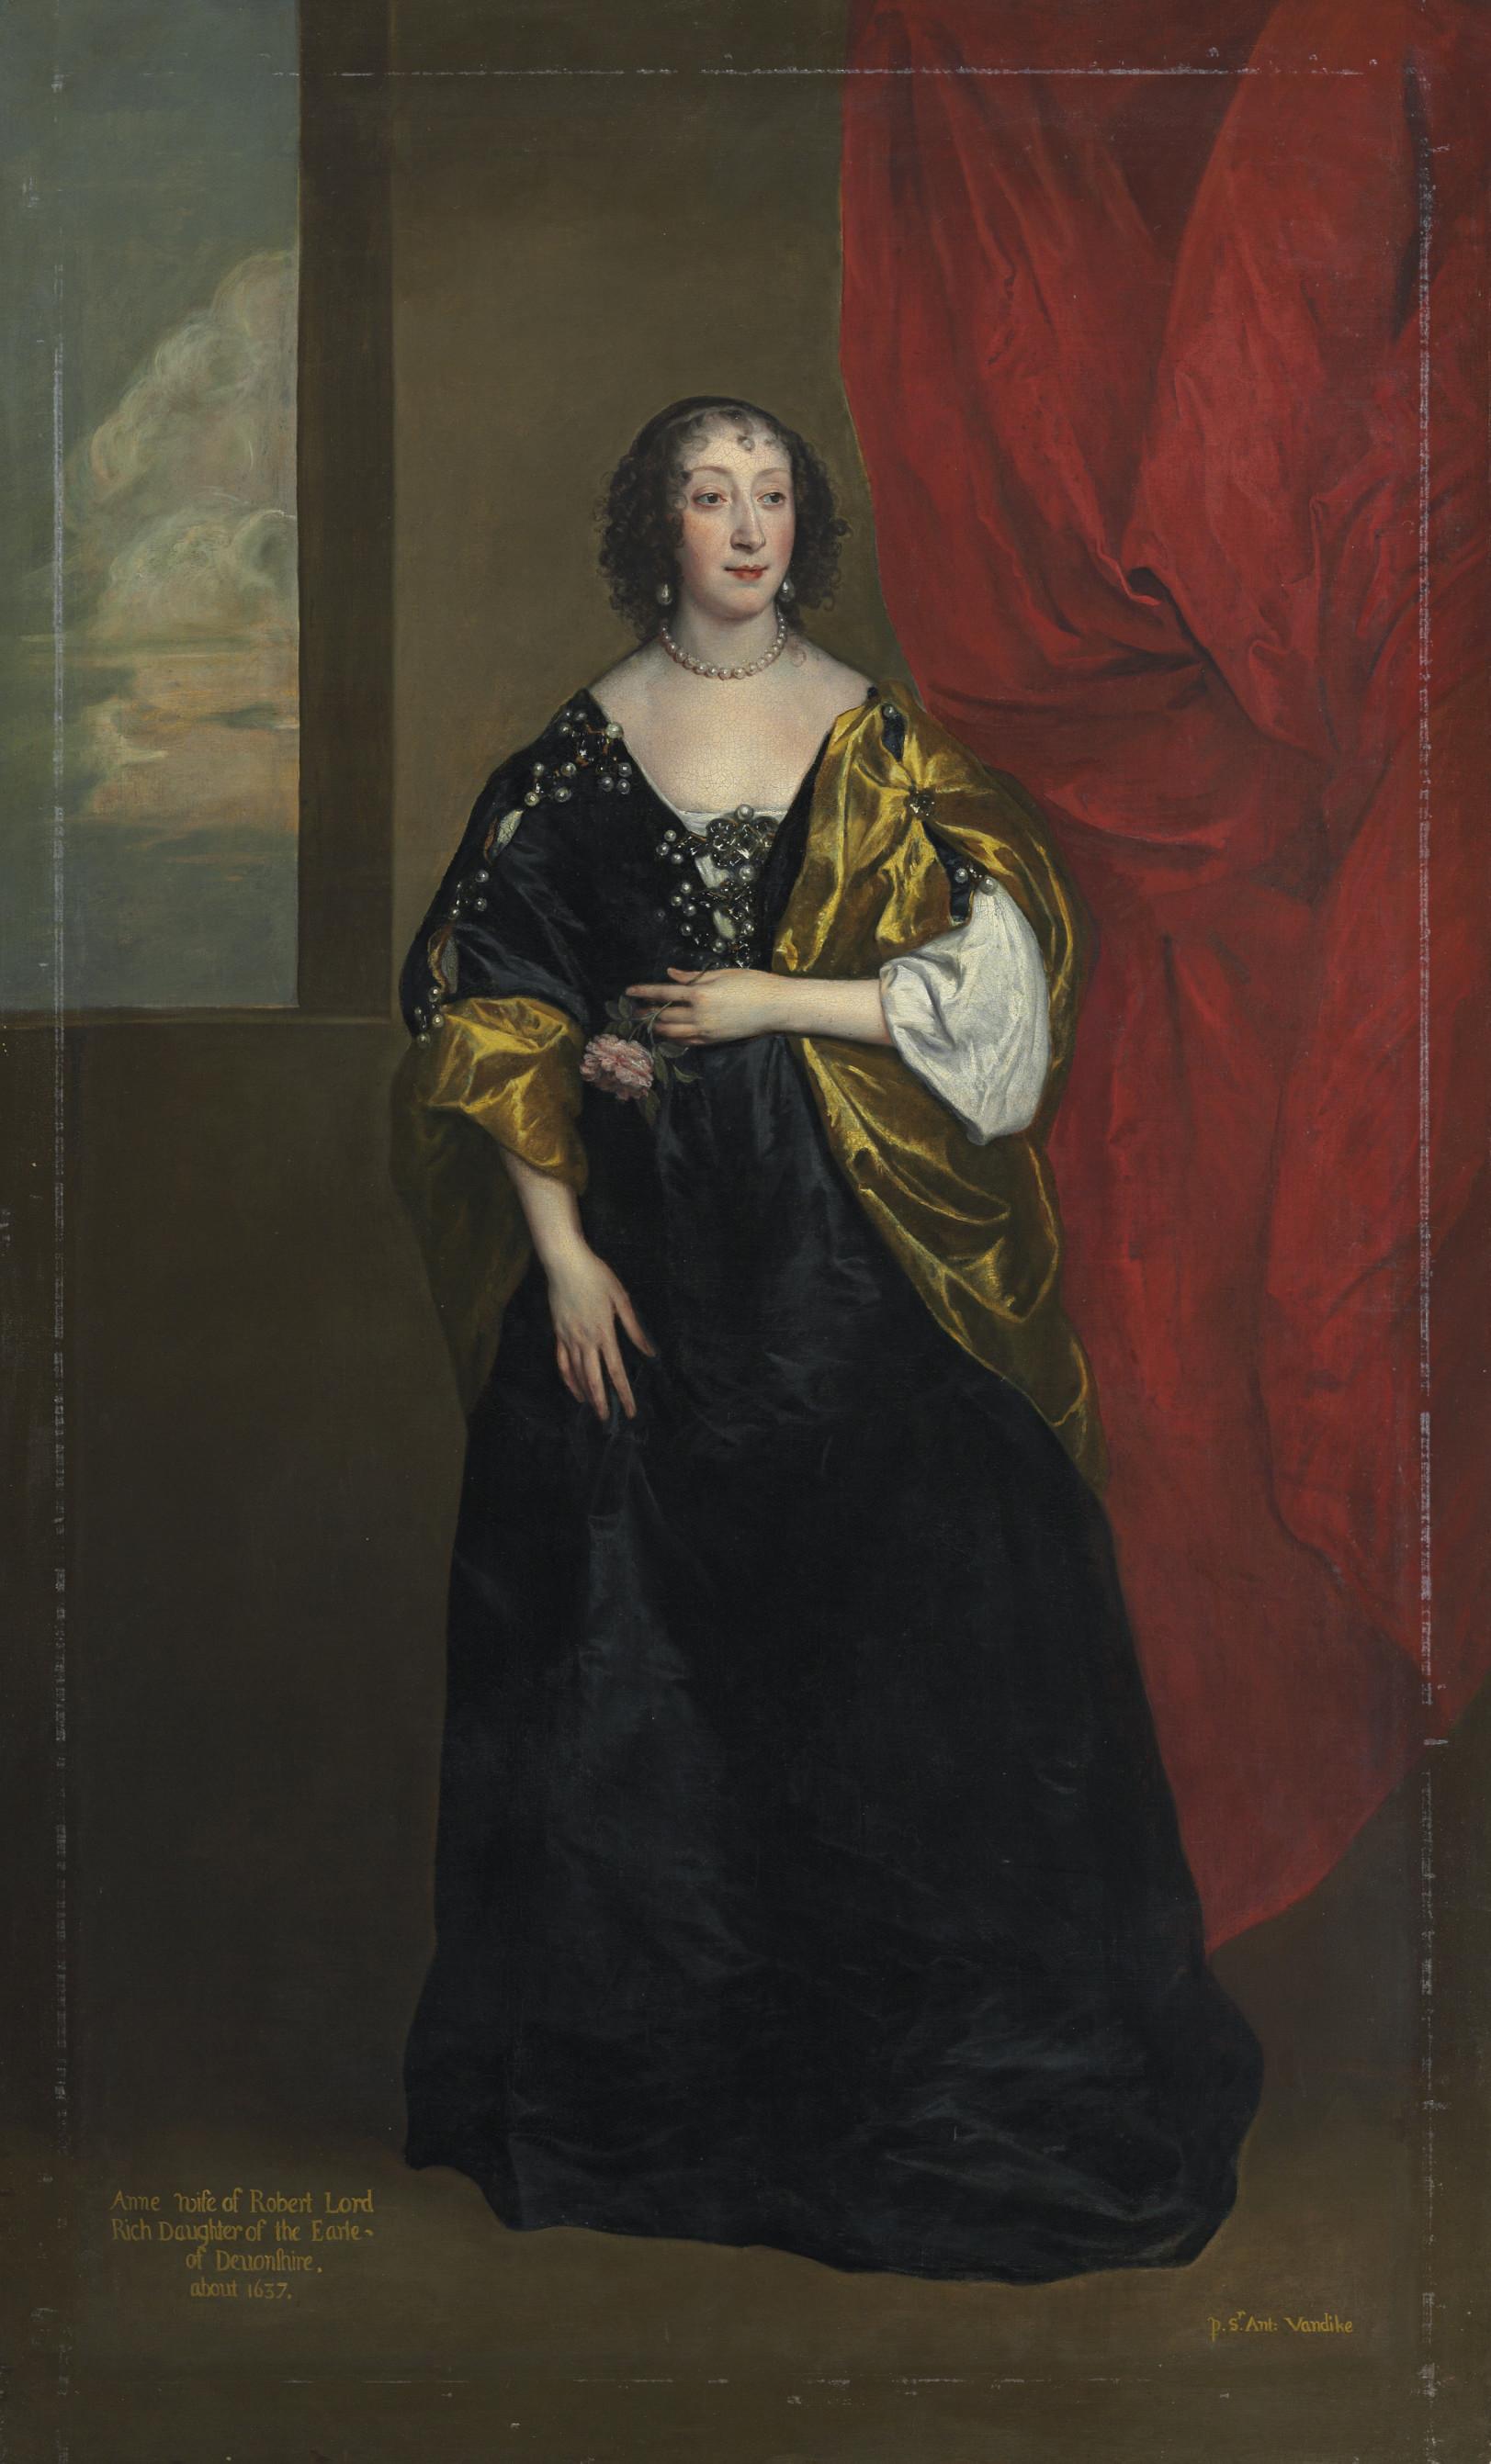 Sir Anthony van Dyck Antwerp 1599-1641 London